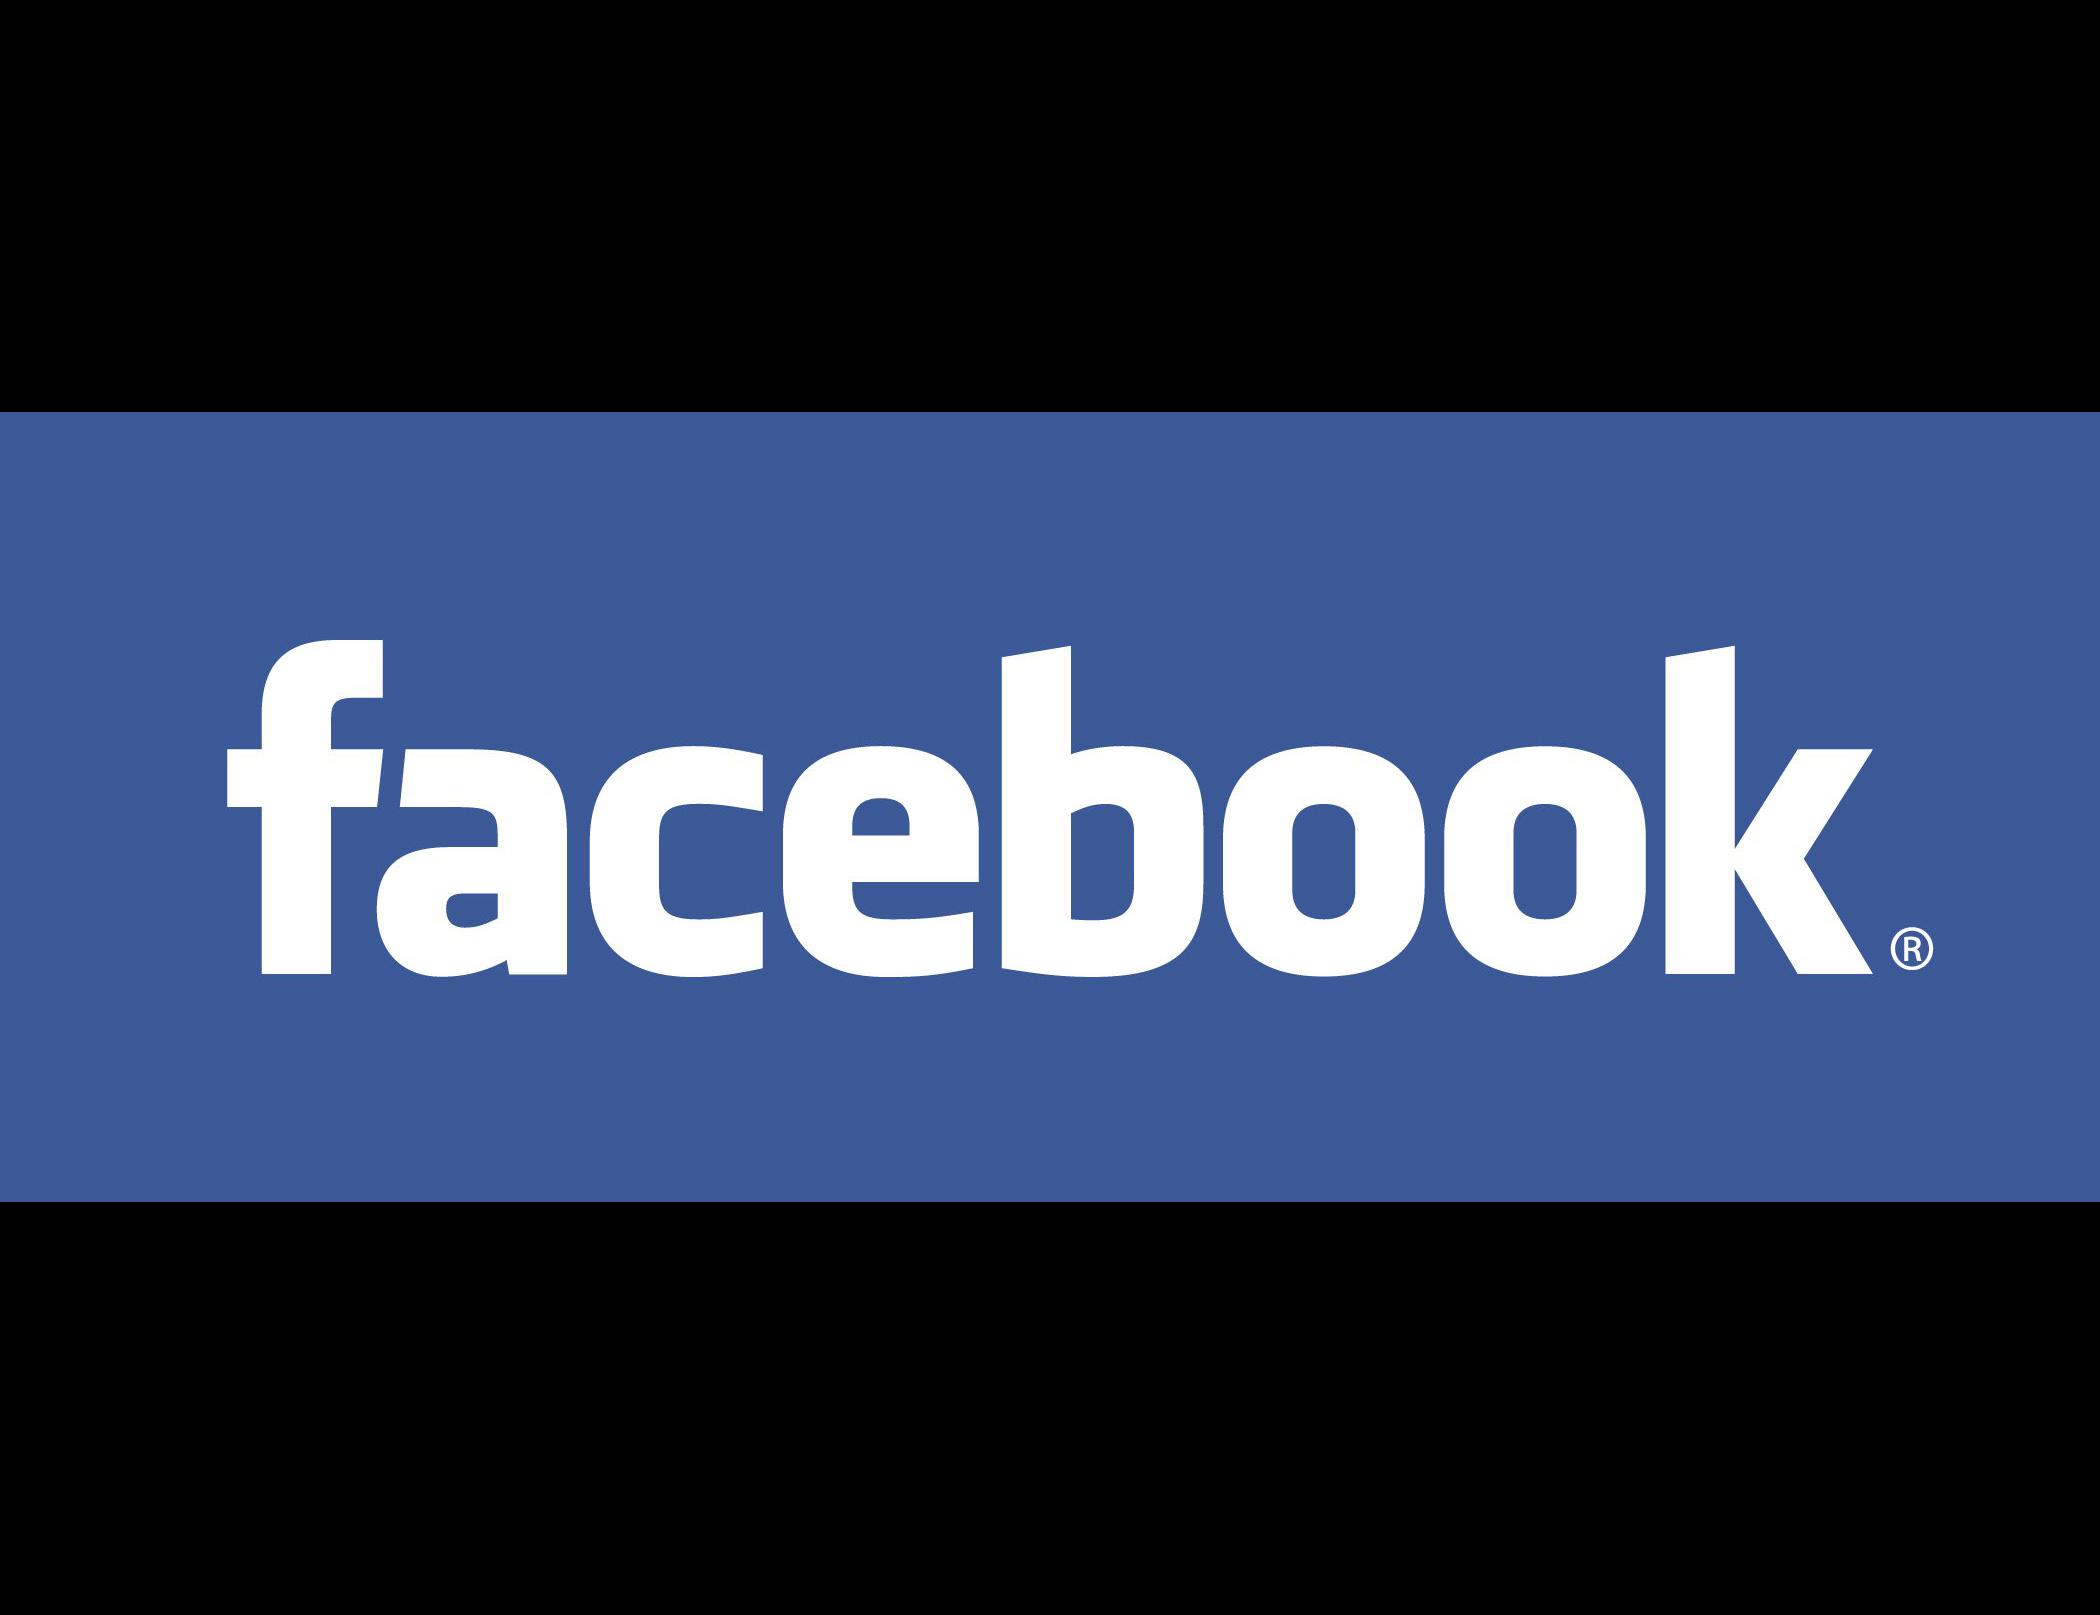 Png . Facebook clipart logo